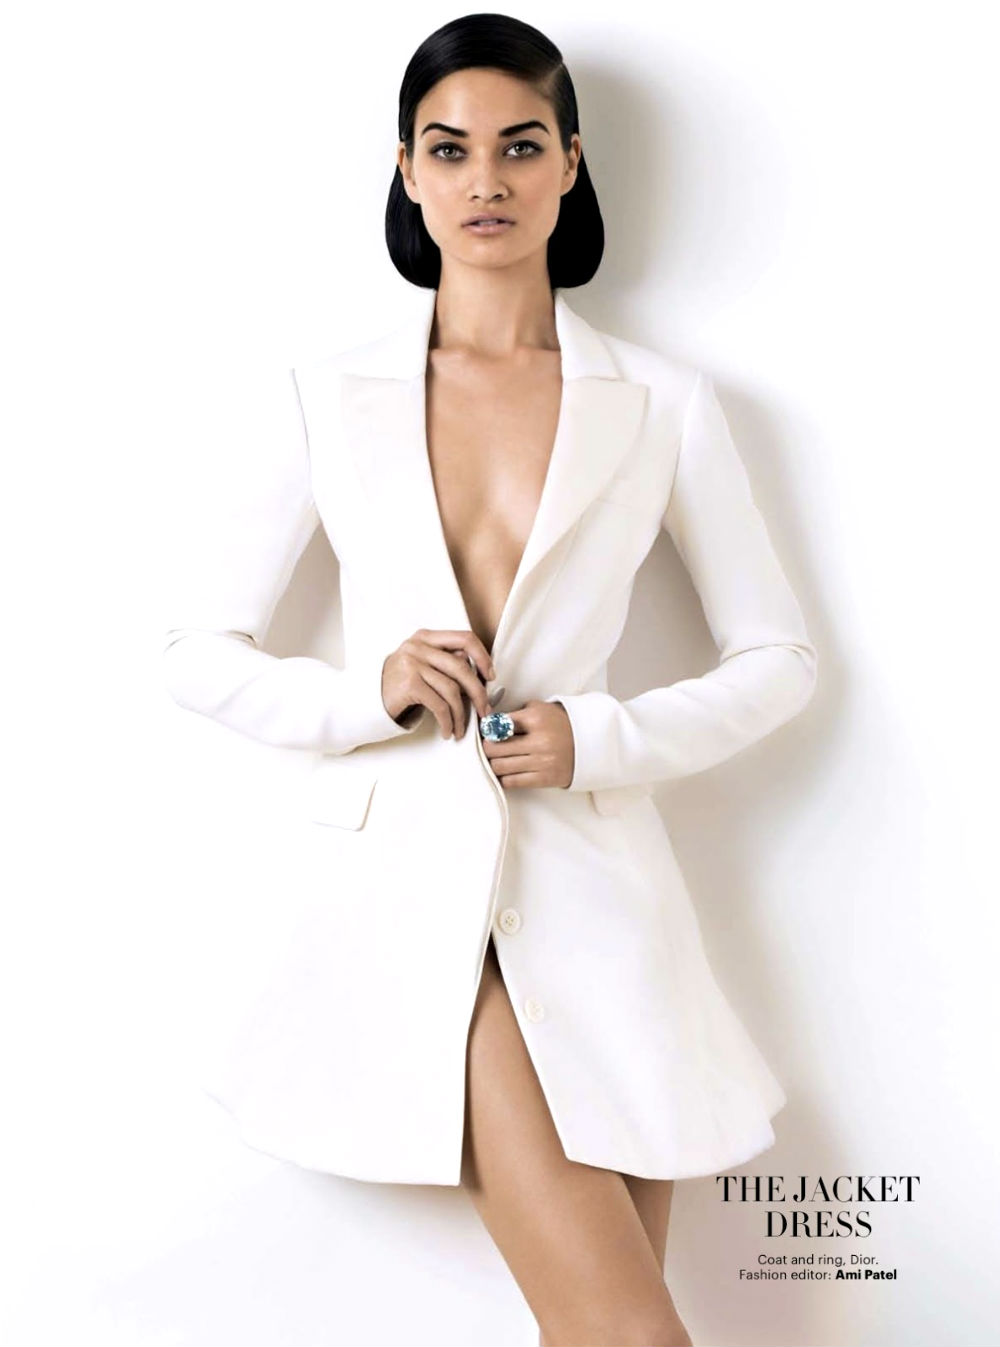 Shanina Shaik for Harper's Bazaar India